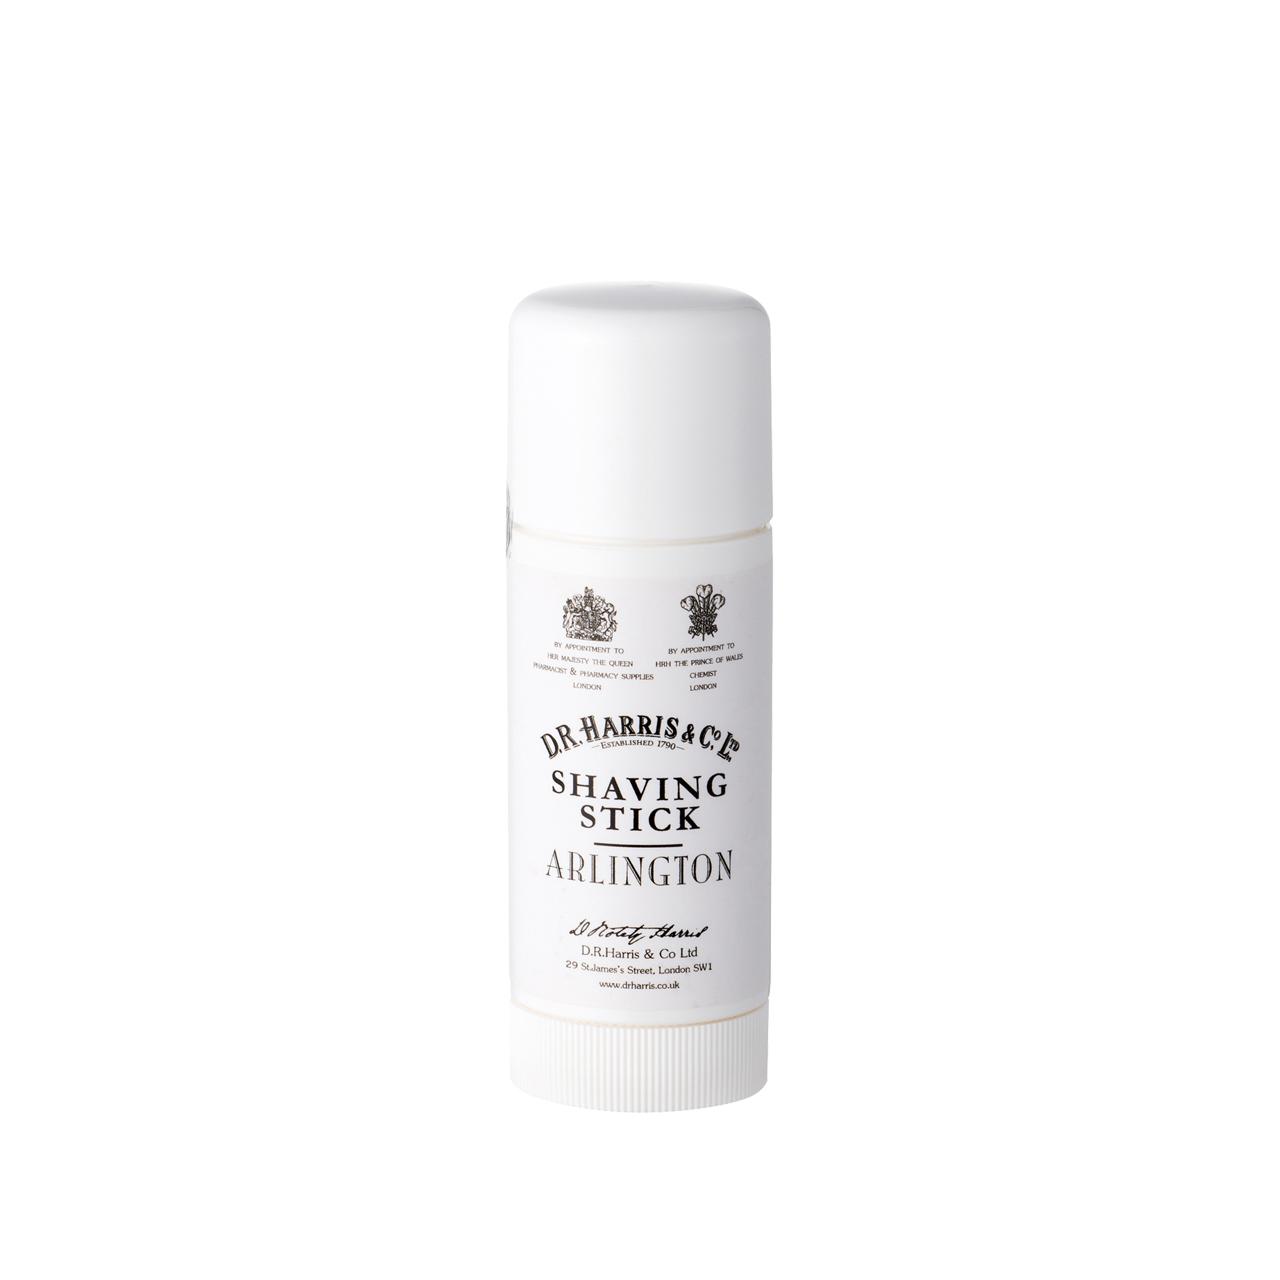 Arlington - Shaving Soap Stick